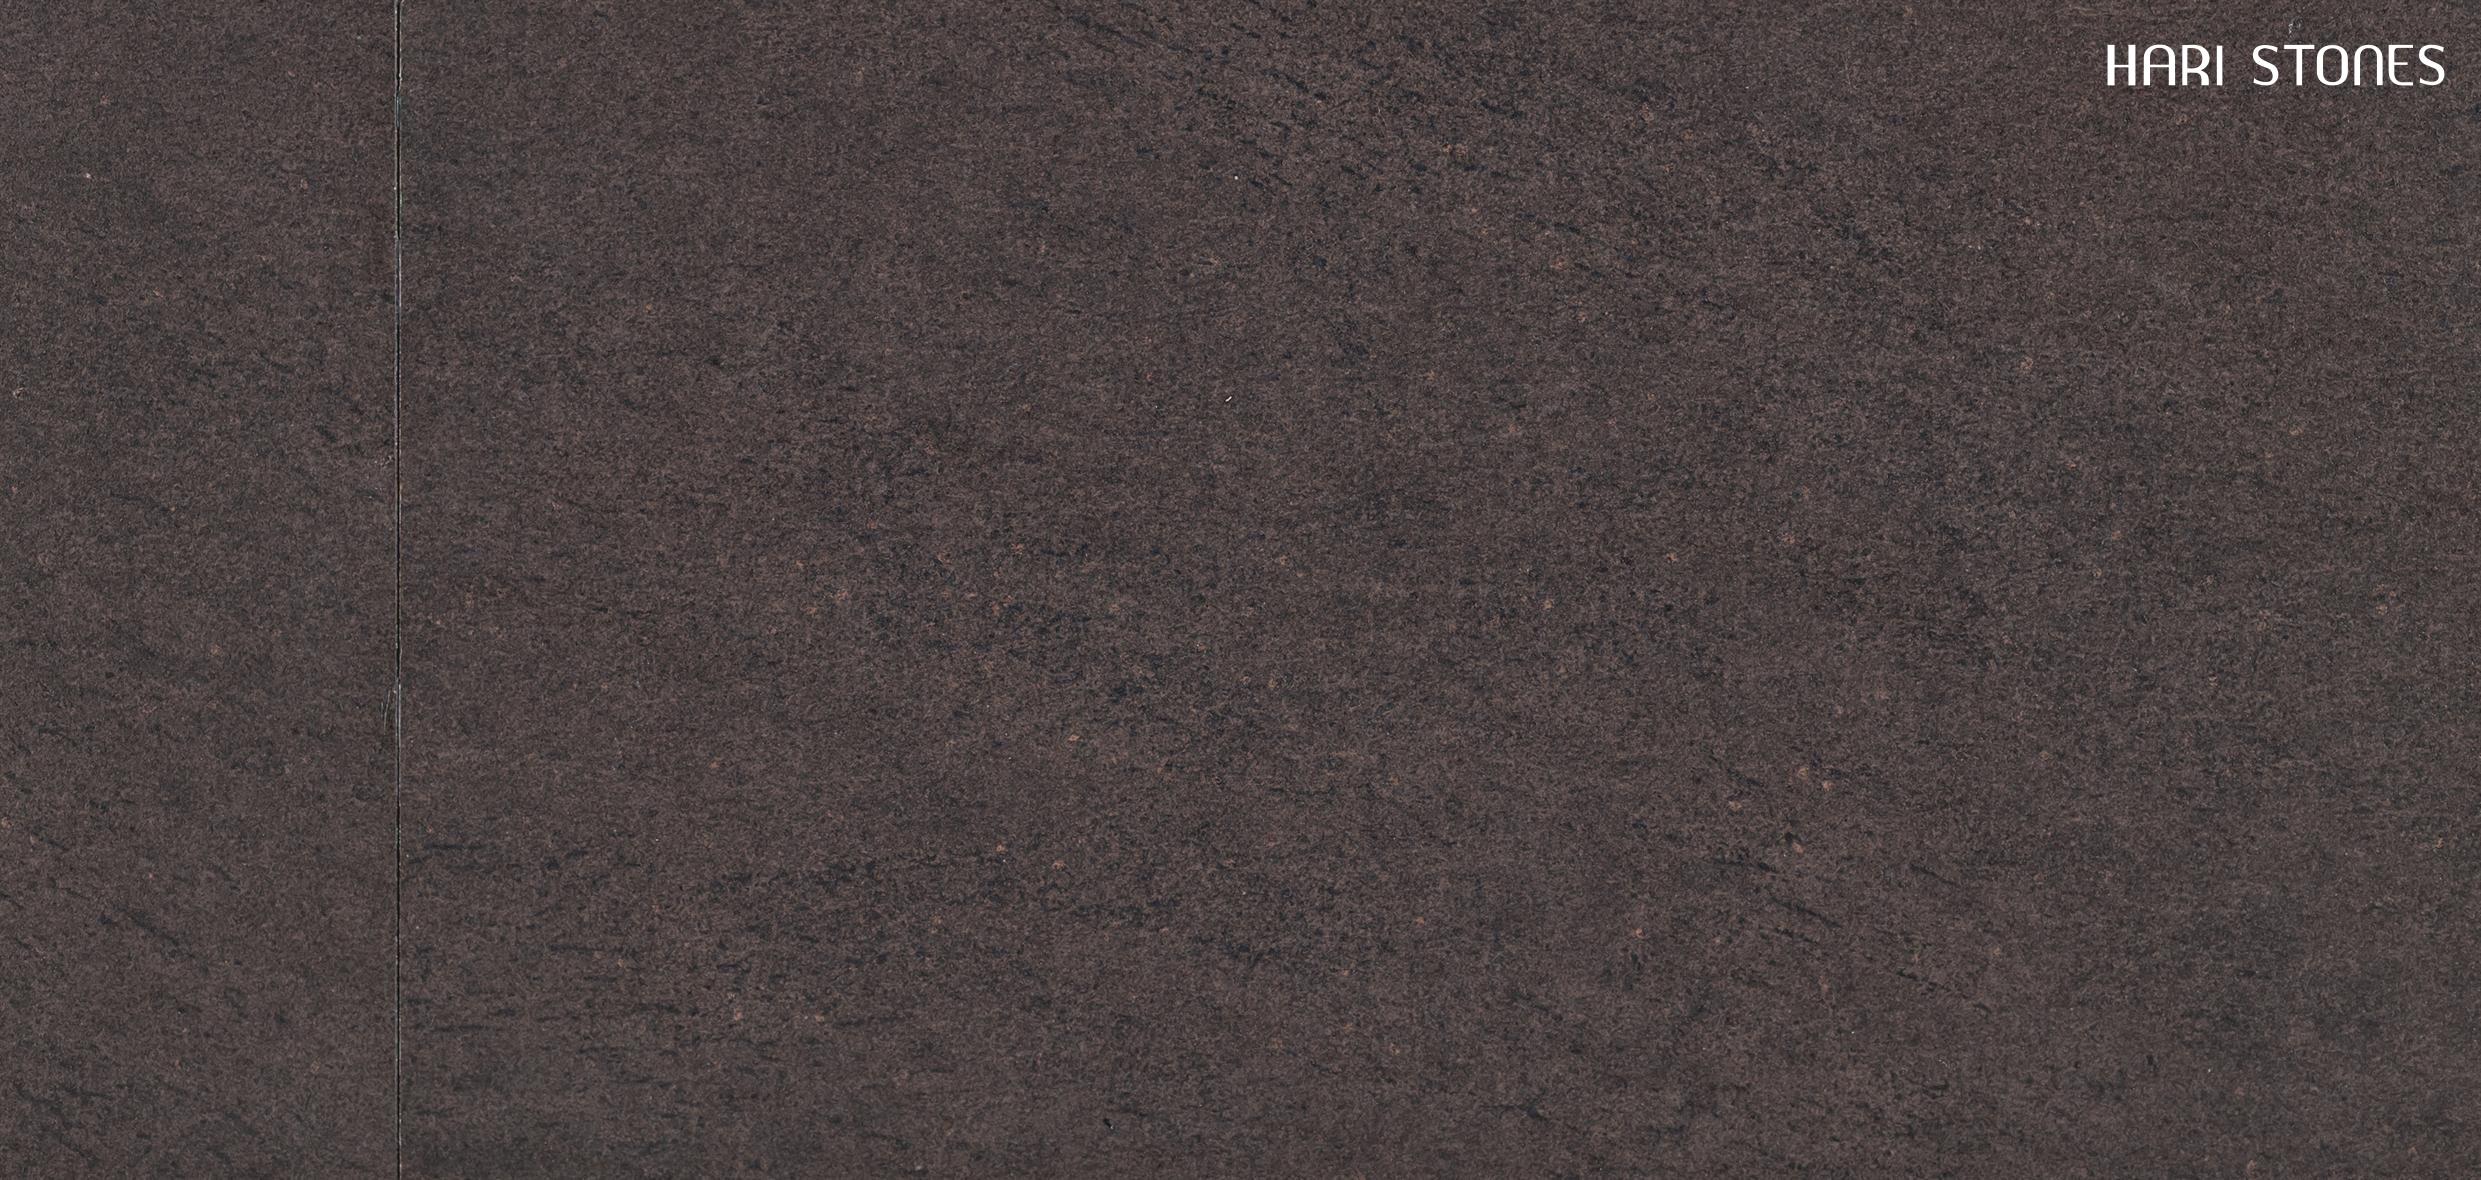 Marazzi Soho Brown Tile Supplier and Distributor